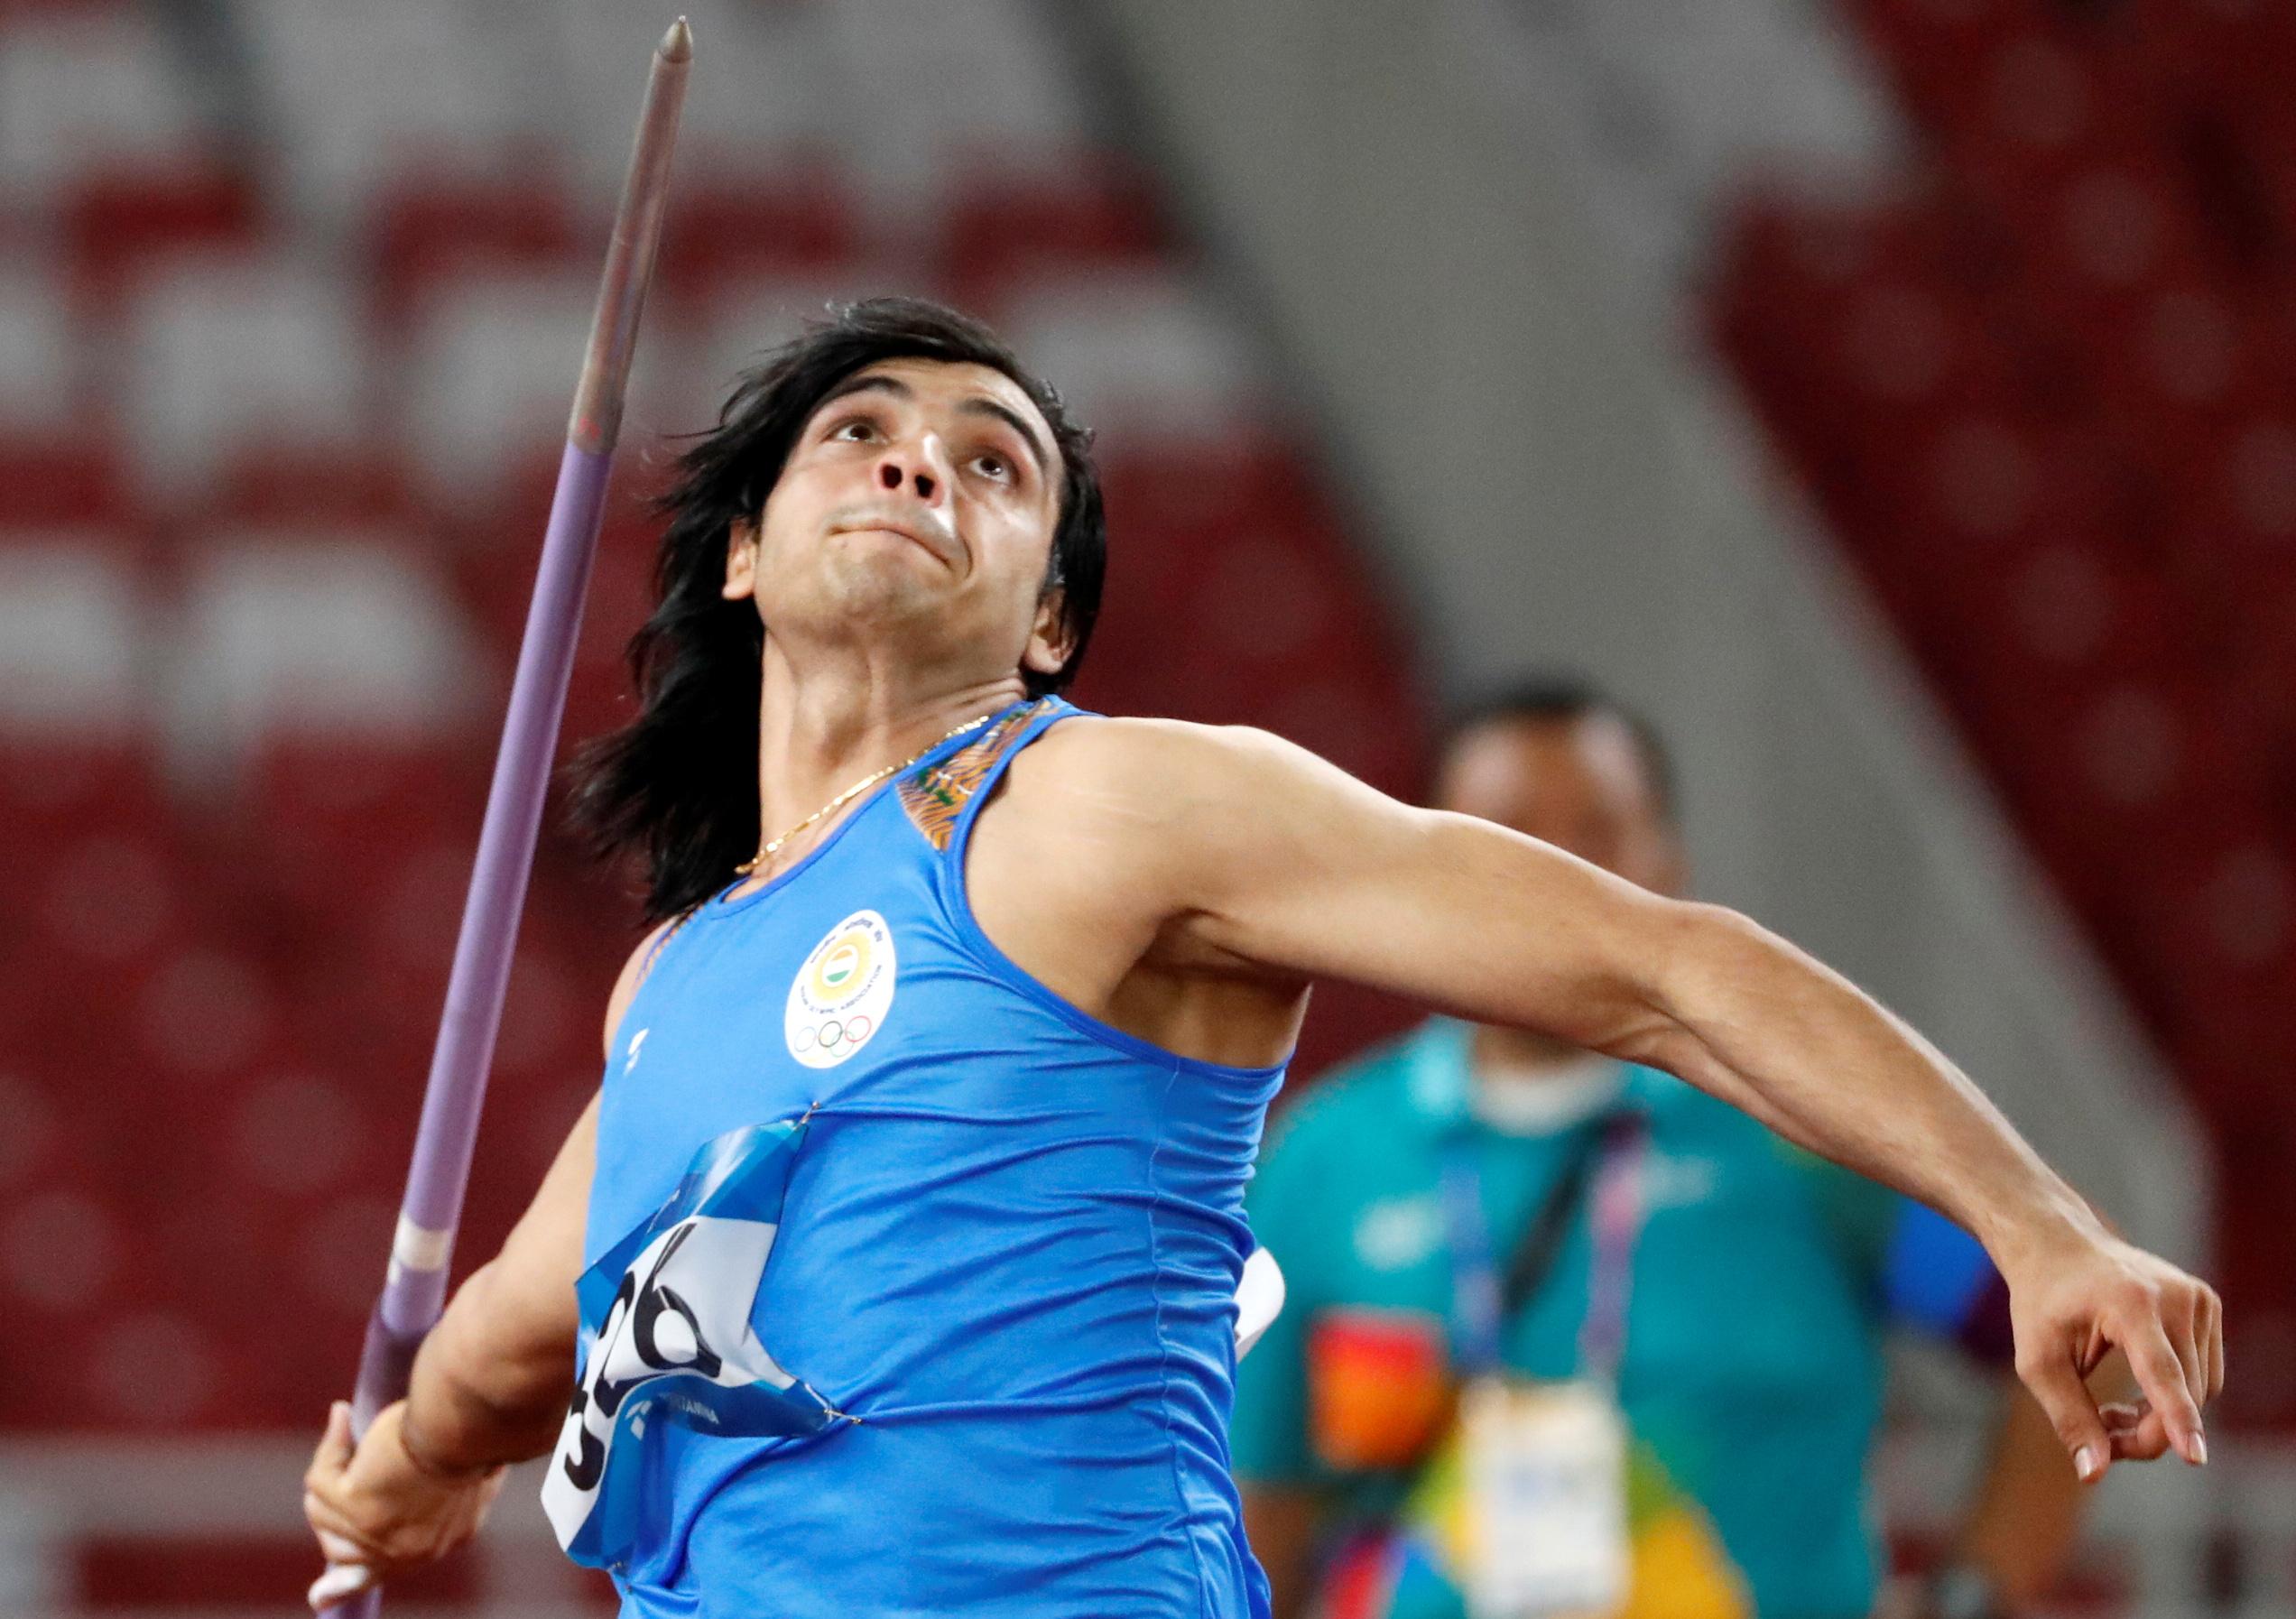 Athletics - 2018 Asian Games - Men's Javelin Throw, Final - GBK Main Stadium, Jakarta, Indonesia - August 27, 2018 - Neeraj Chopra of India in action. REUTERS/Issei Kato